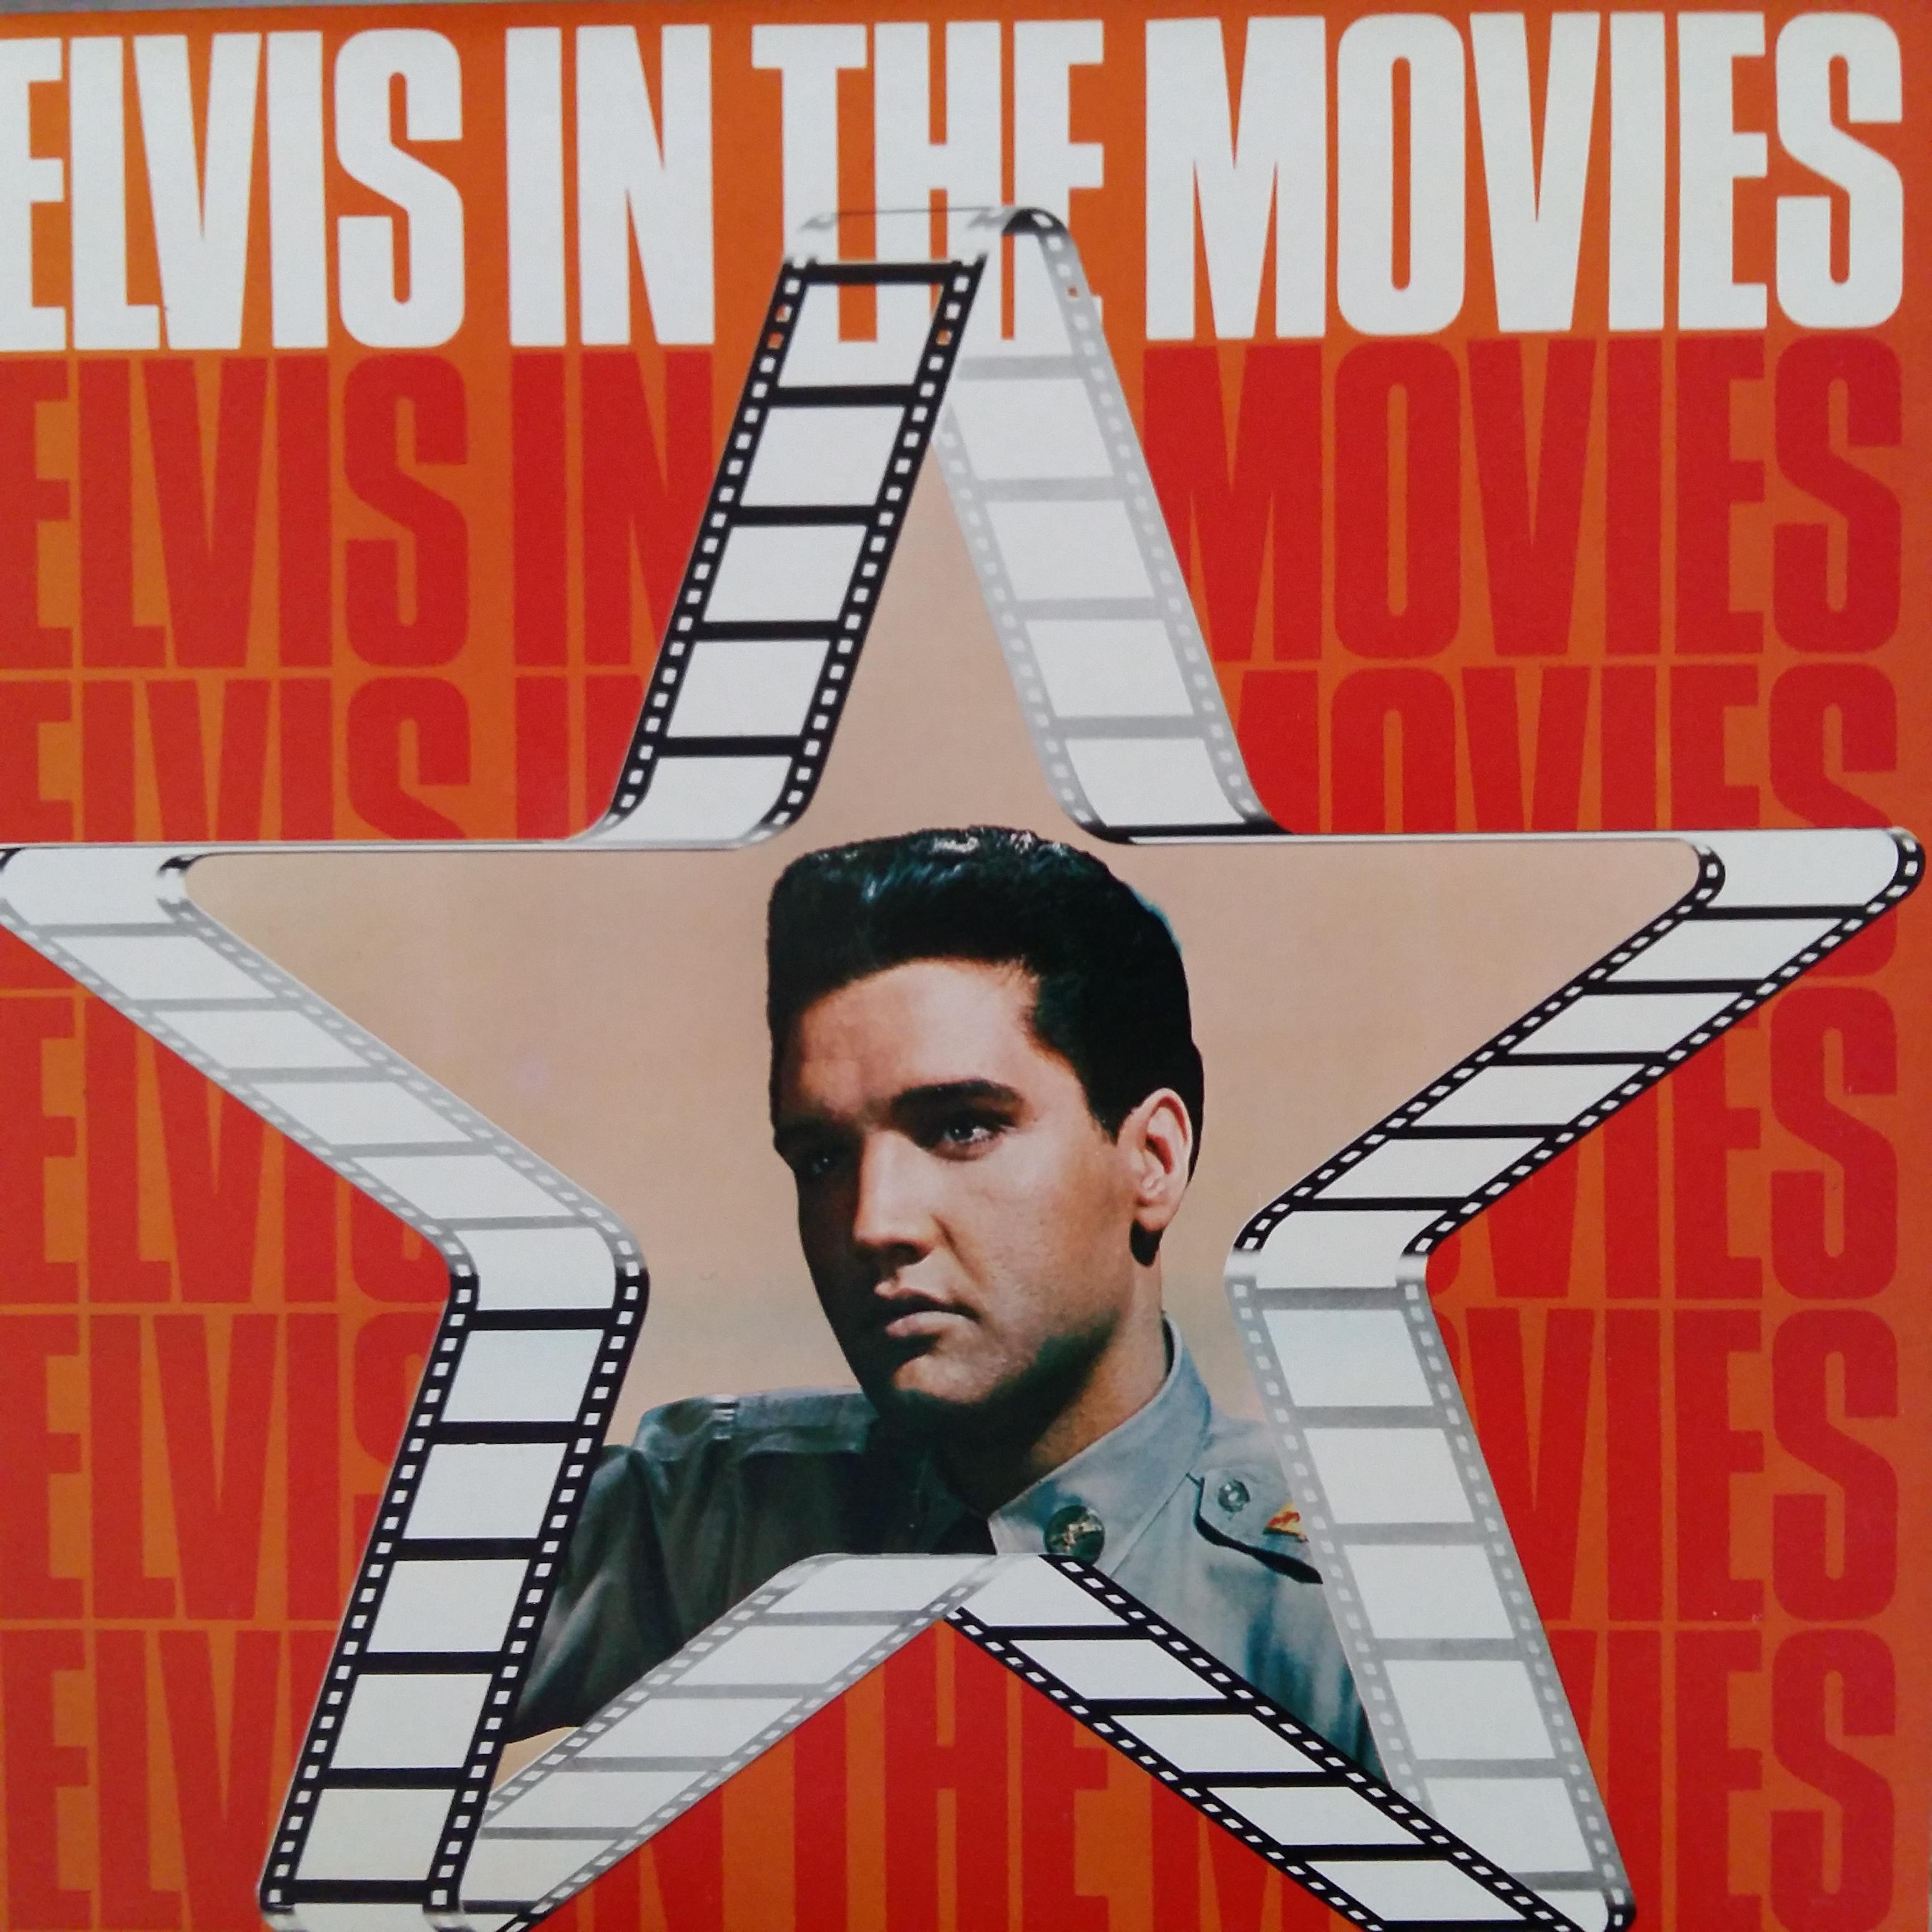 Elvis presley complete movie collection